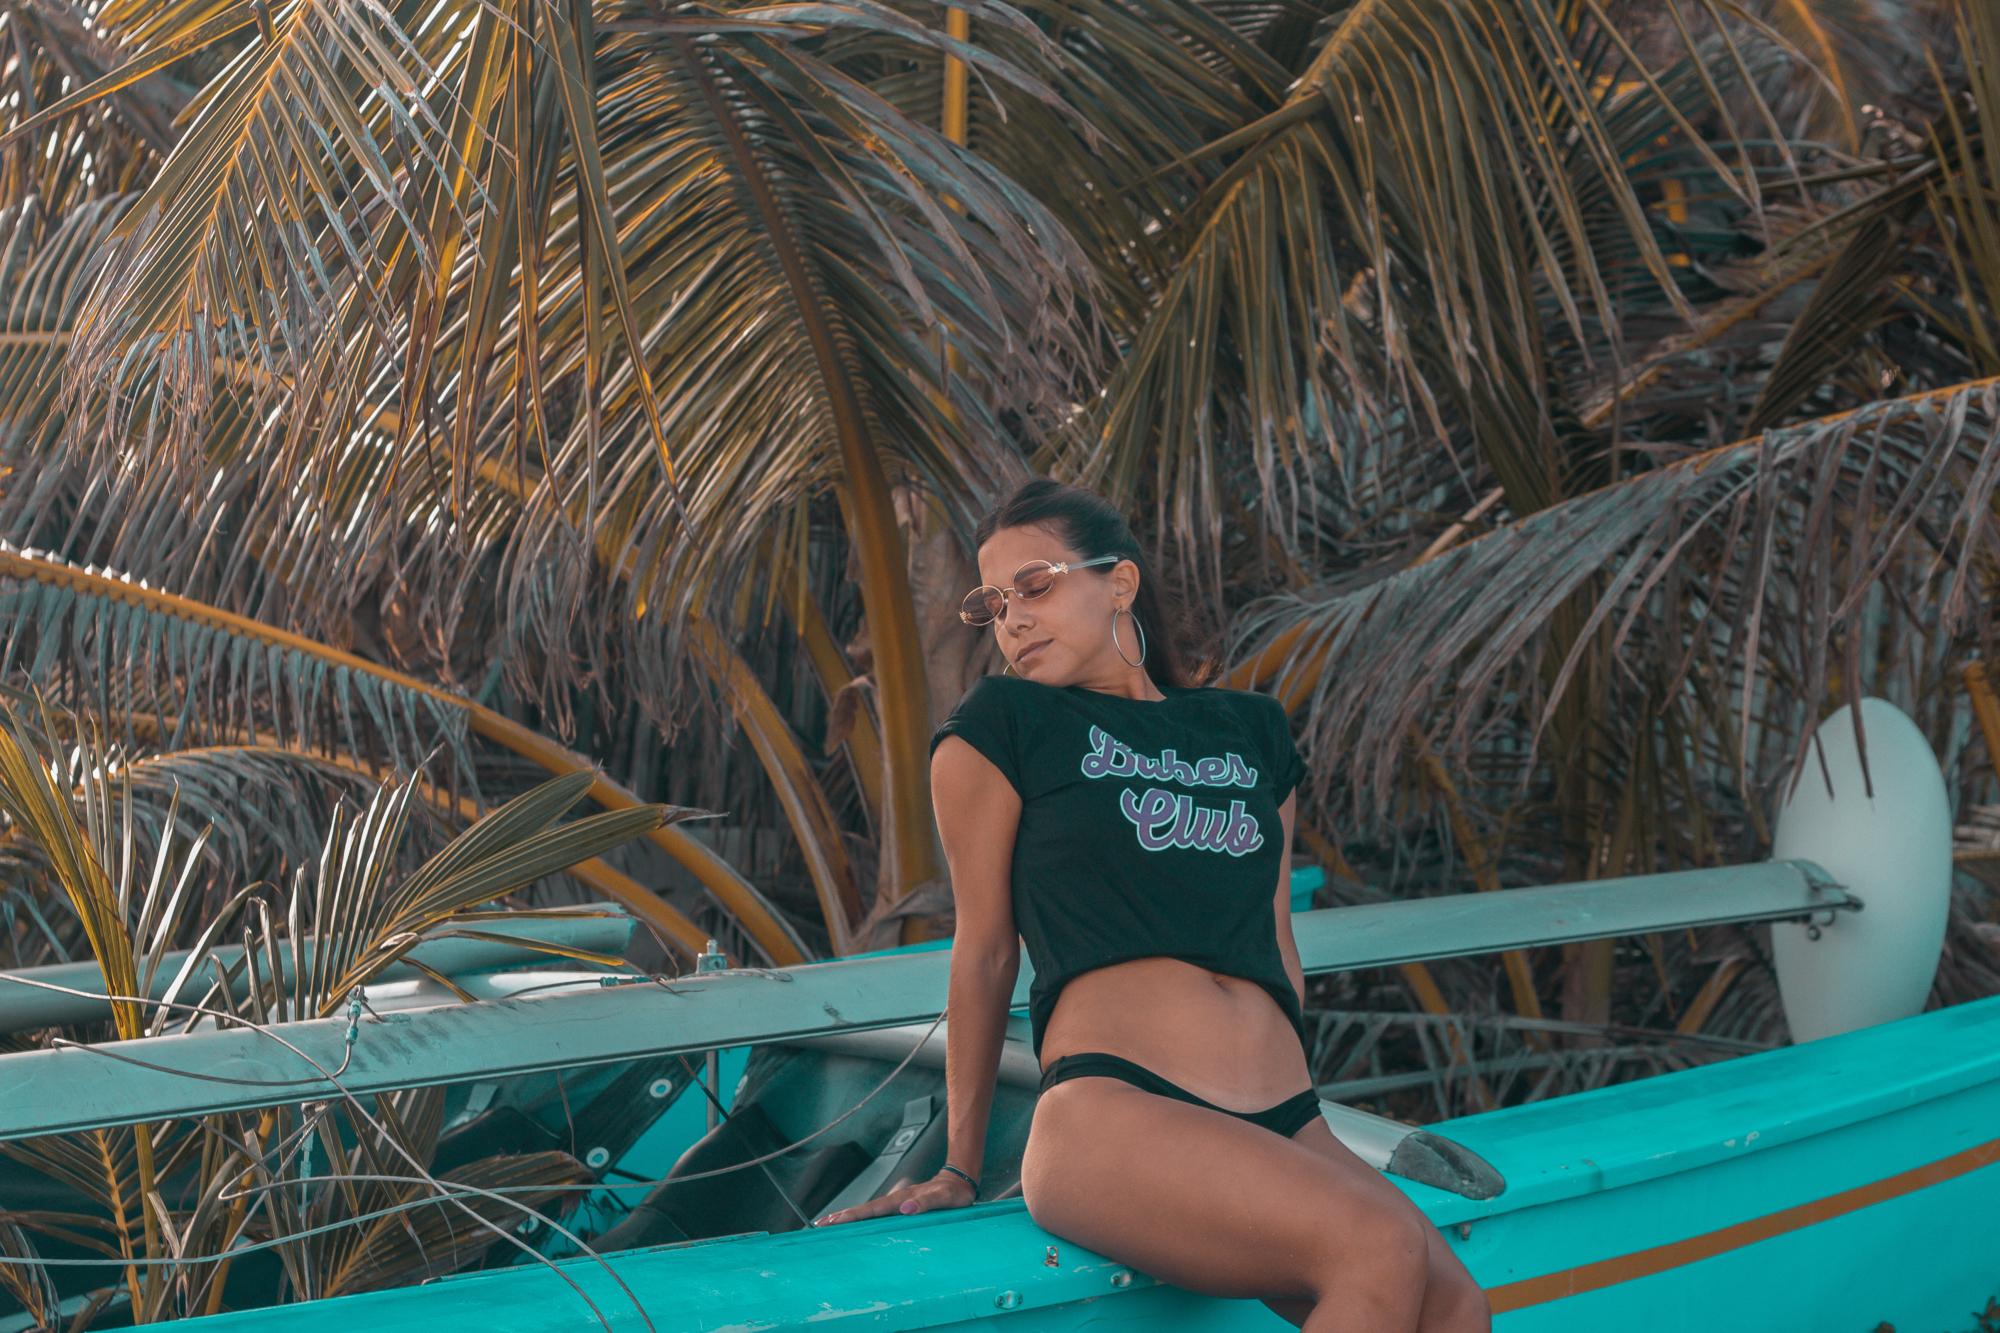 flor gaona, sitocorock, influencer, riviera maya, playa del carmen, mexico, car, fashion, streestyle, 90s, 80s, blogger, makeup, boat, beach, babe